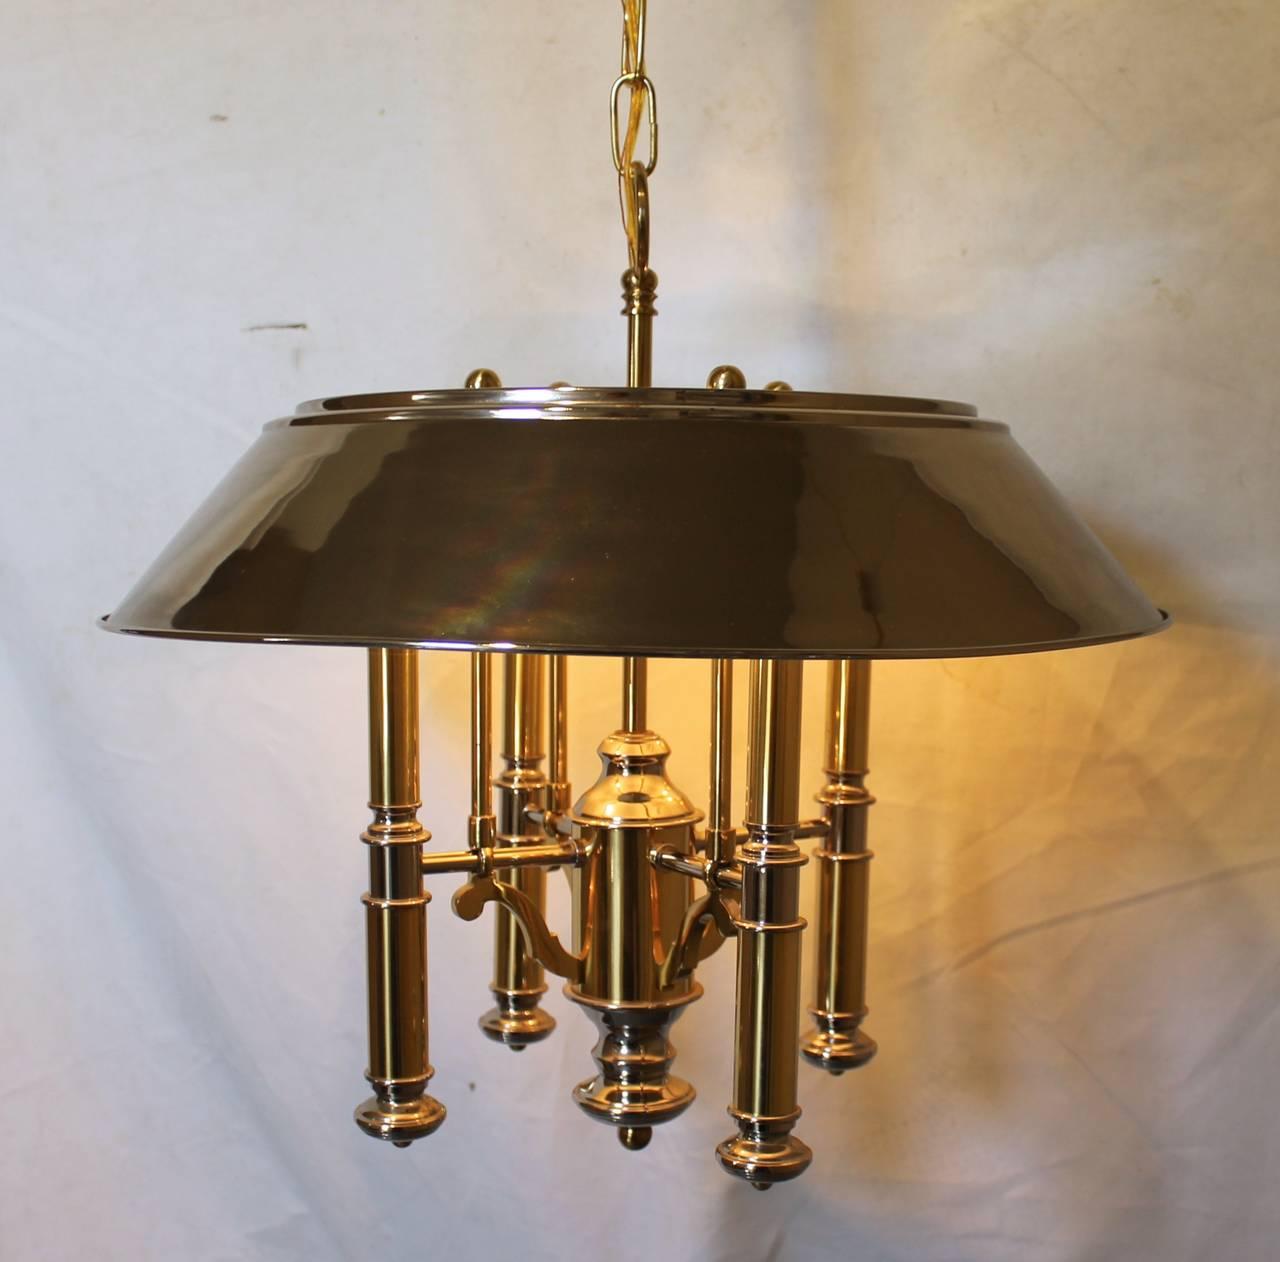 Lightolier Ring Chandelier At 1stdibs: Lightolier Brass And Nickel Four-Light Chandelier For Sale